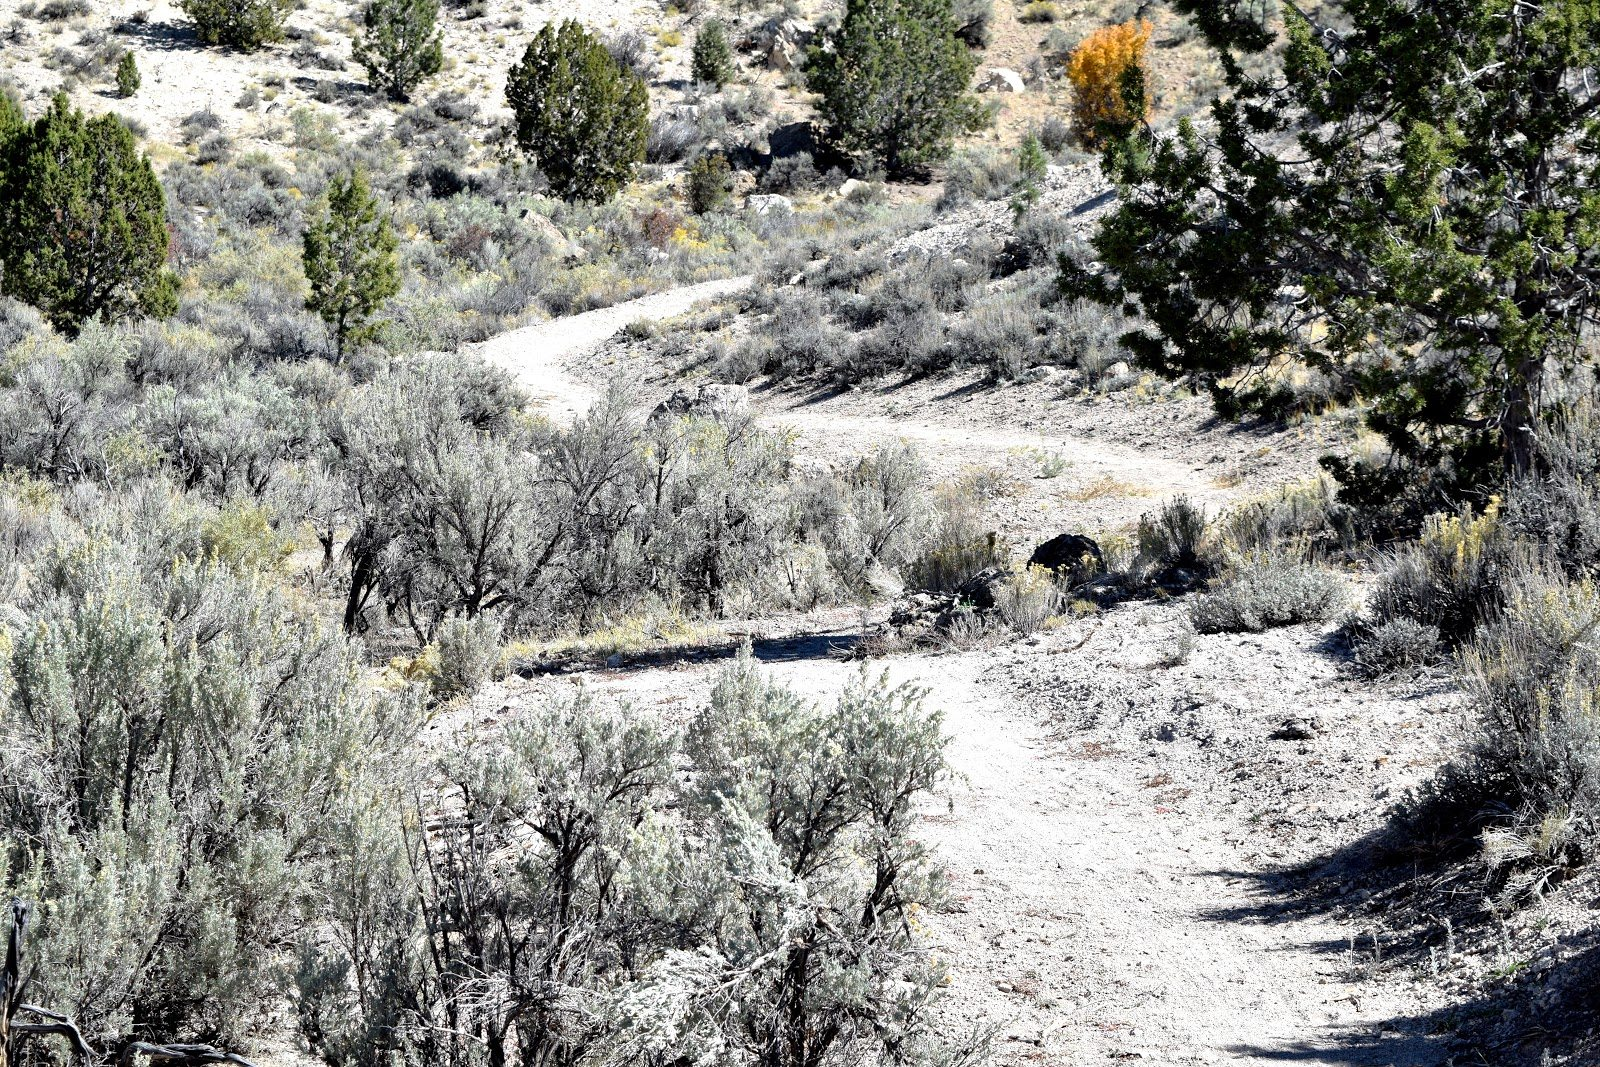 Mountain Bike Trails Advancing